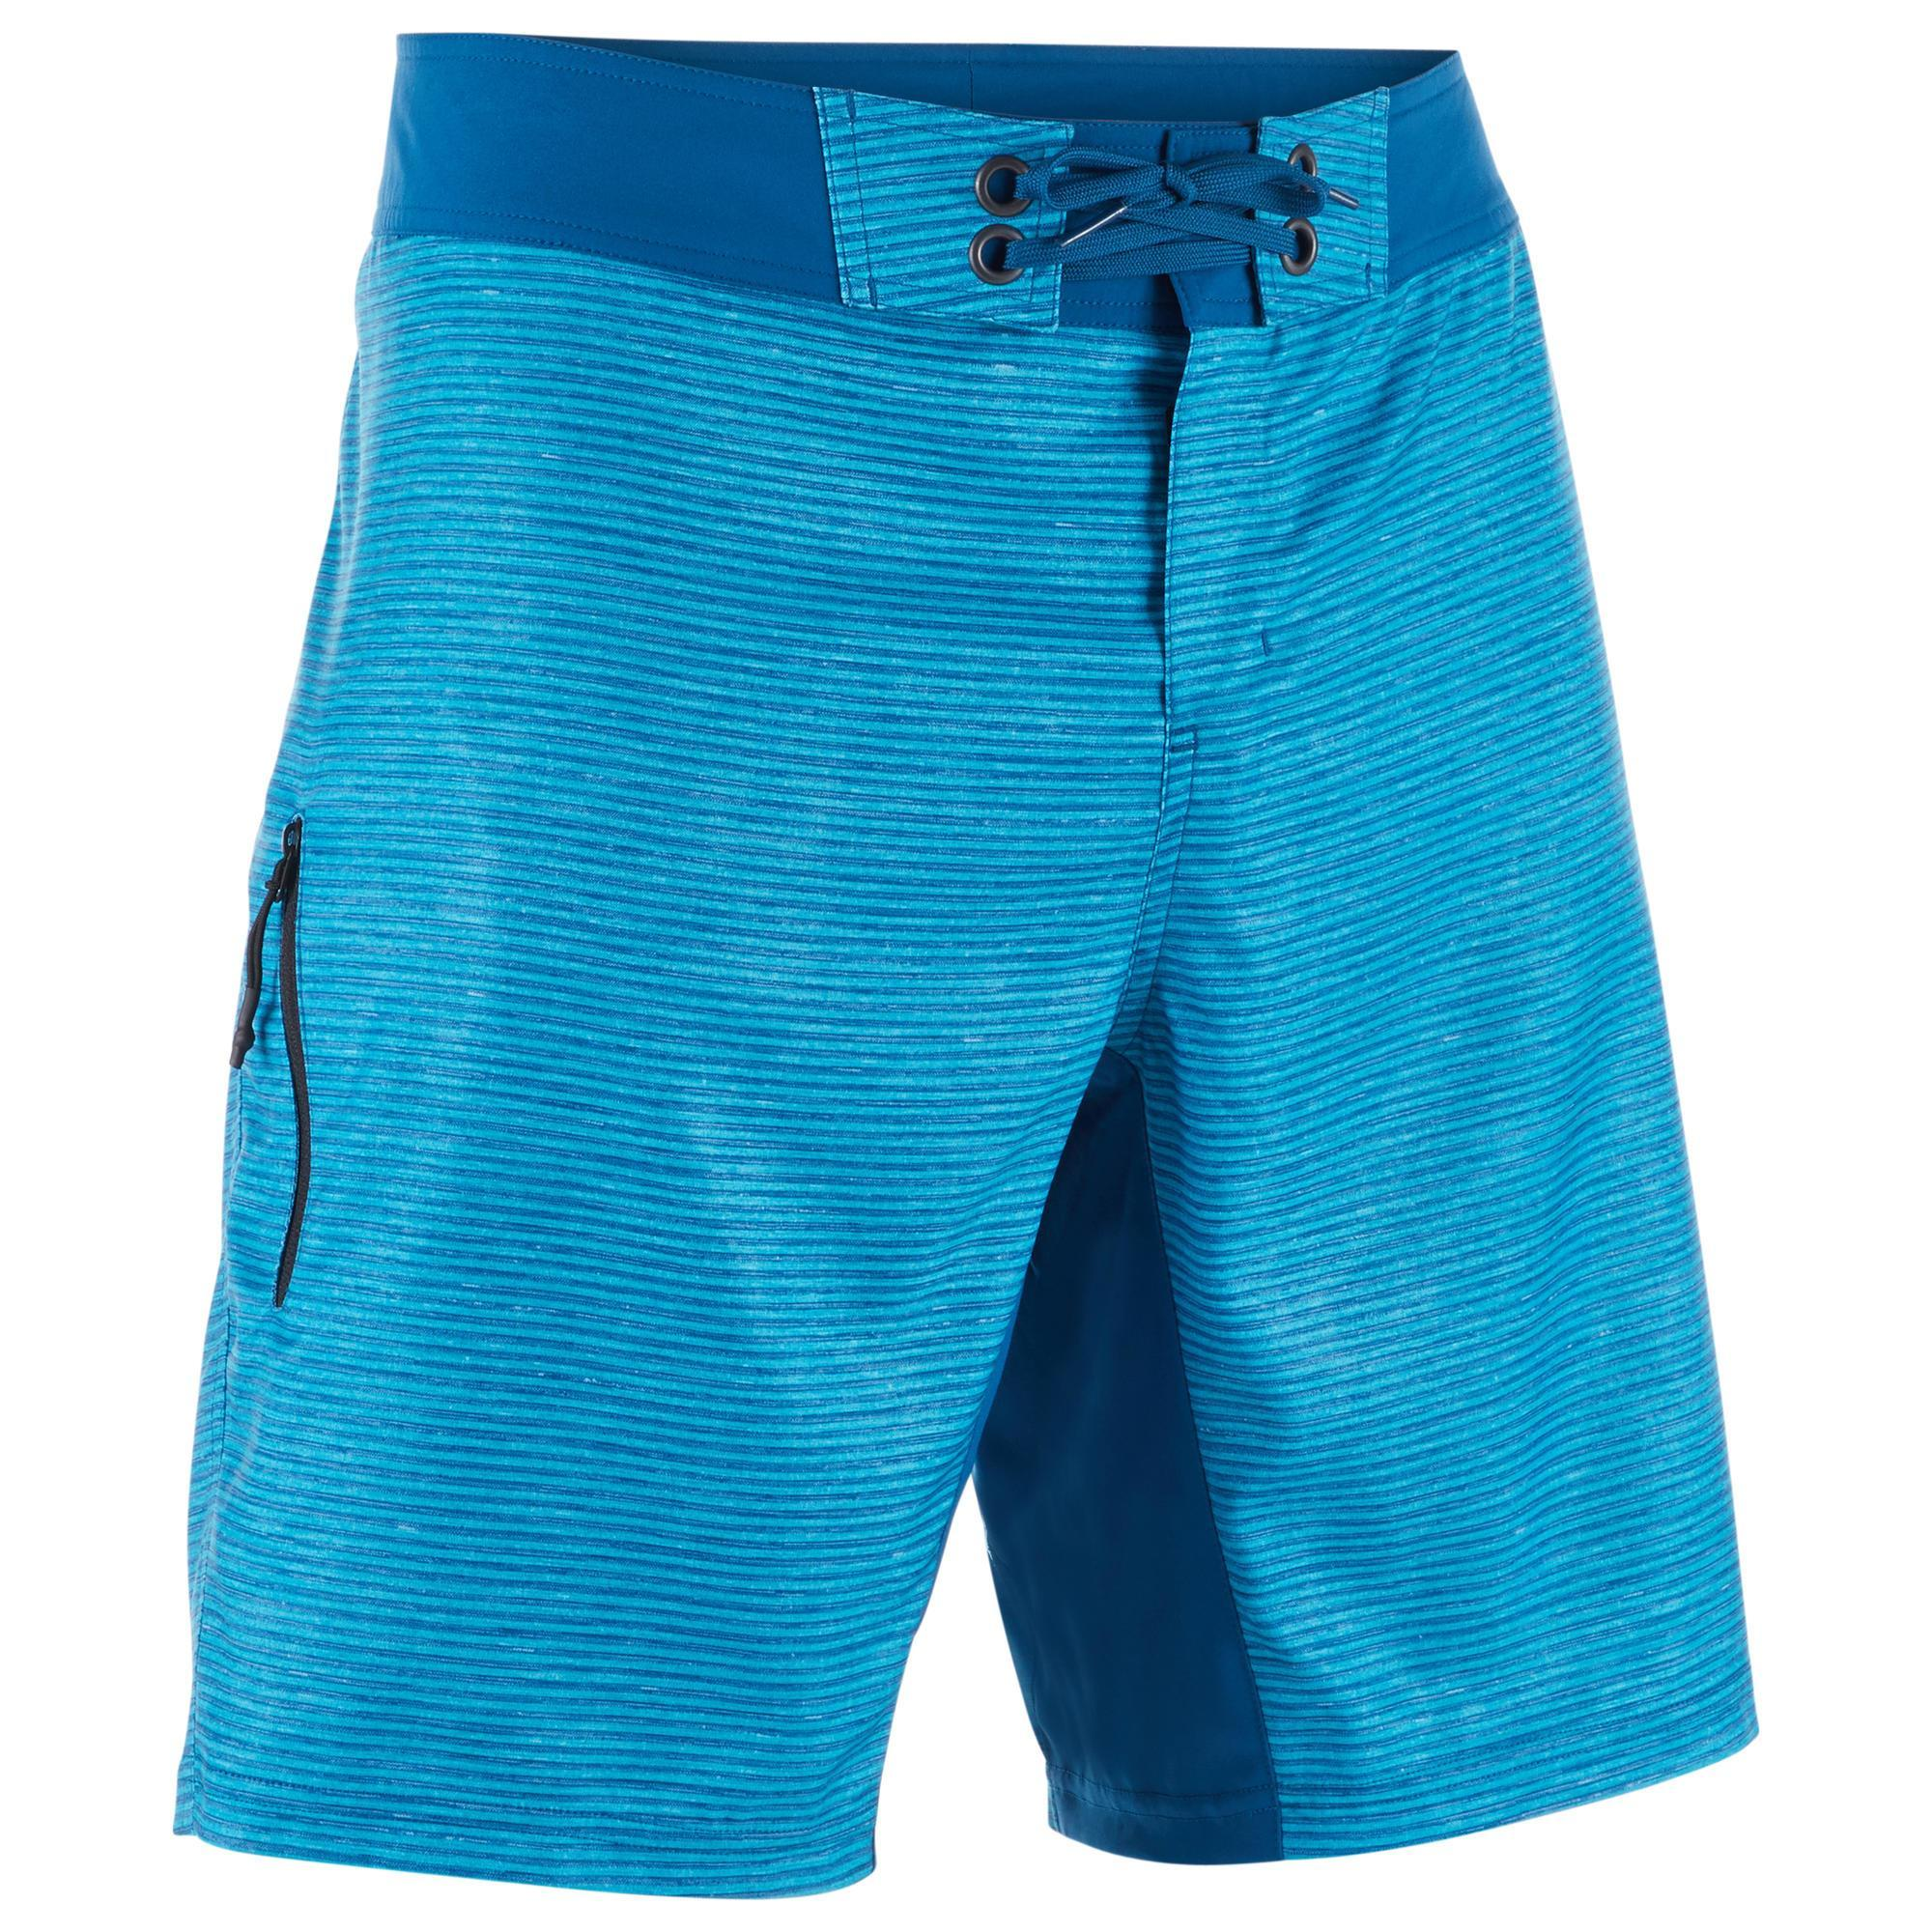 Herren Olaian Boardshorts Surfen Standard 500S Heather blau | 03583788022305